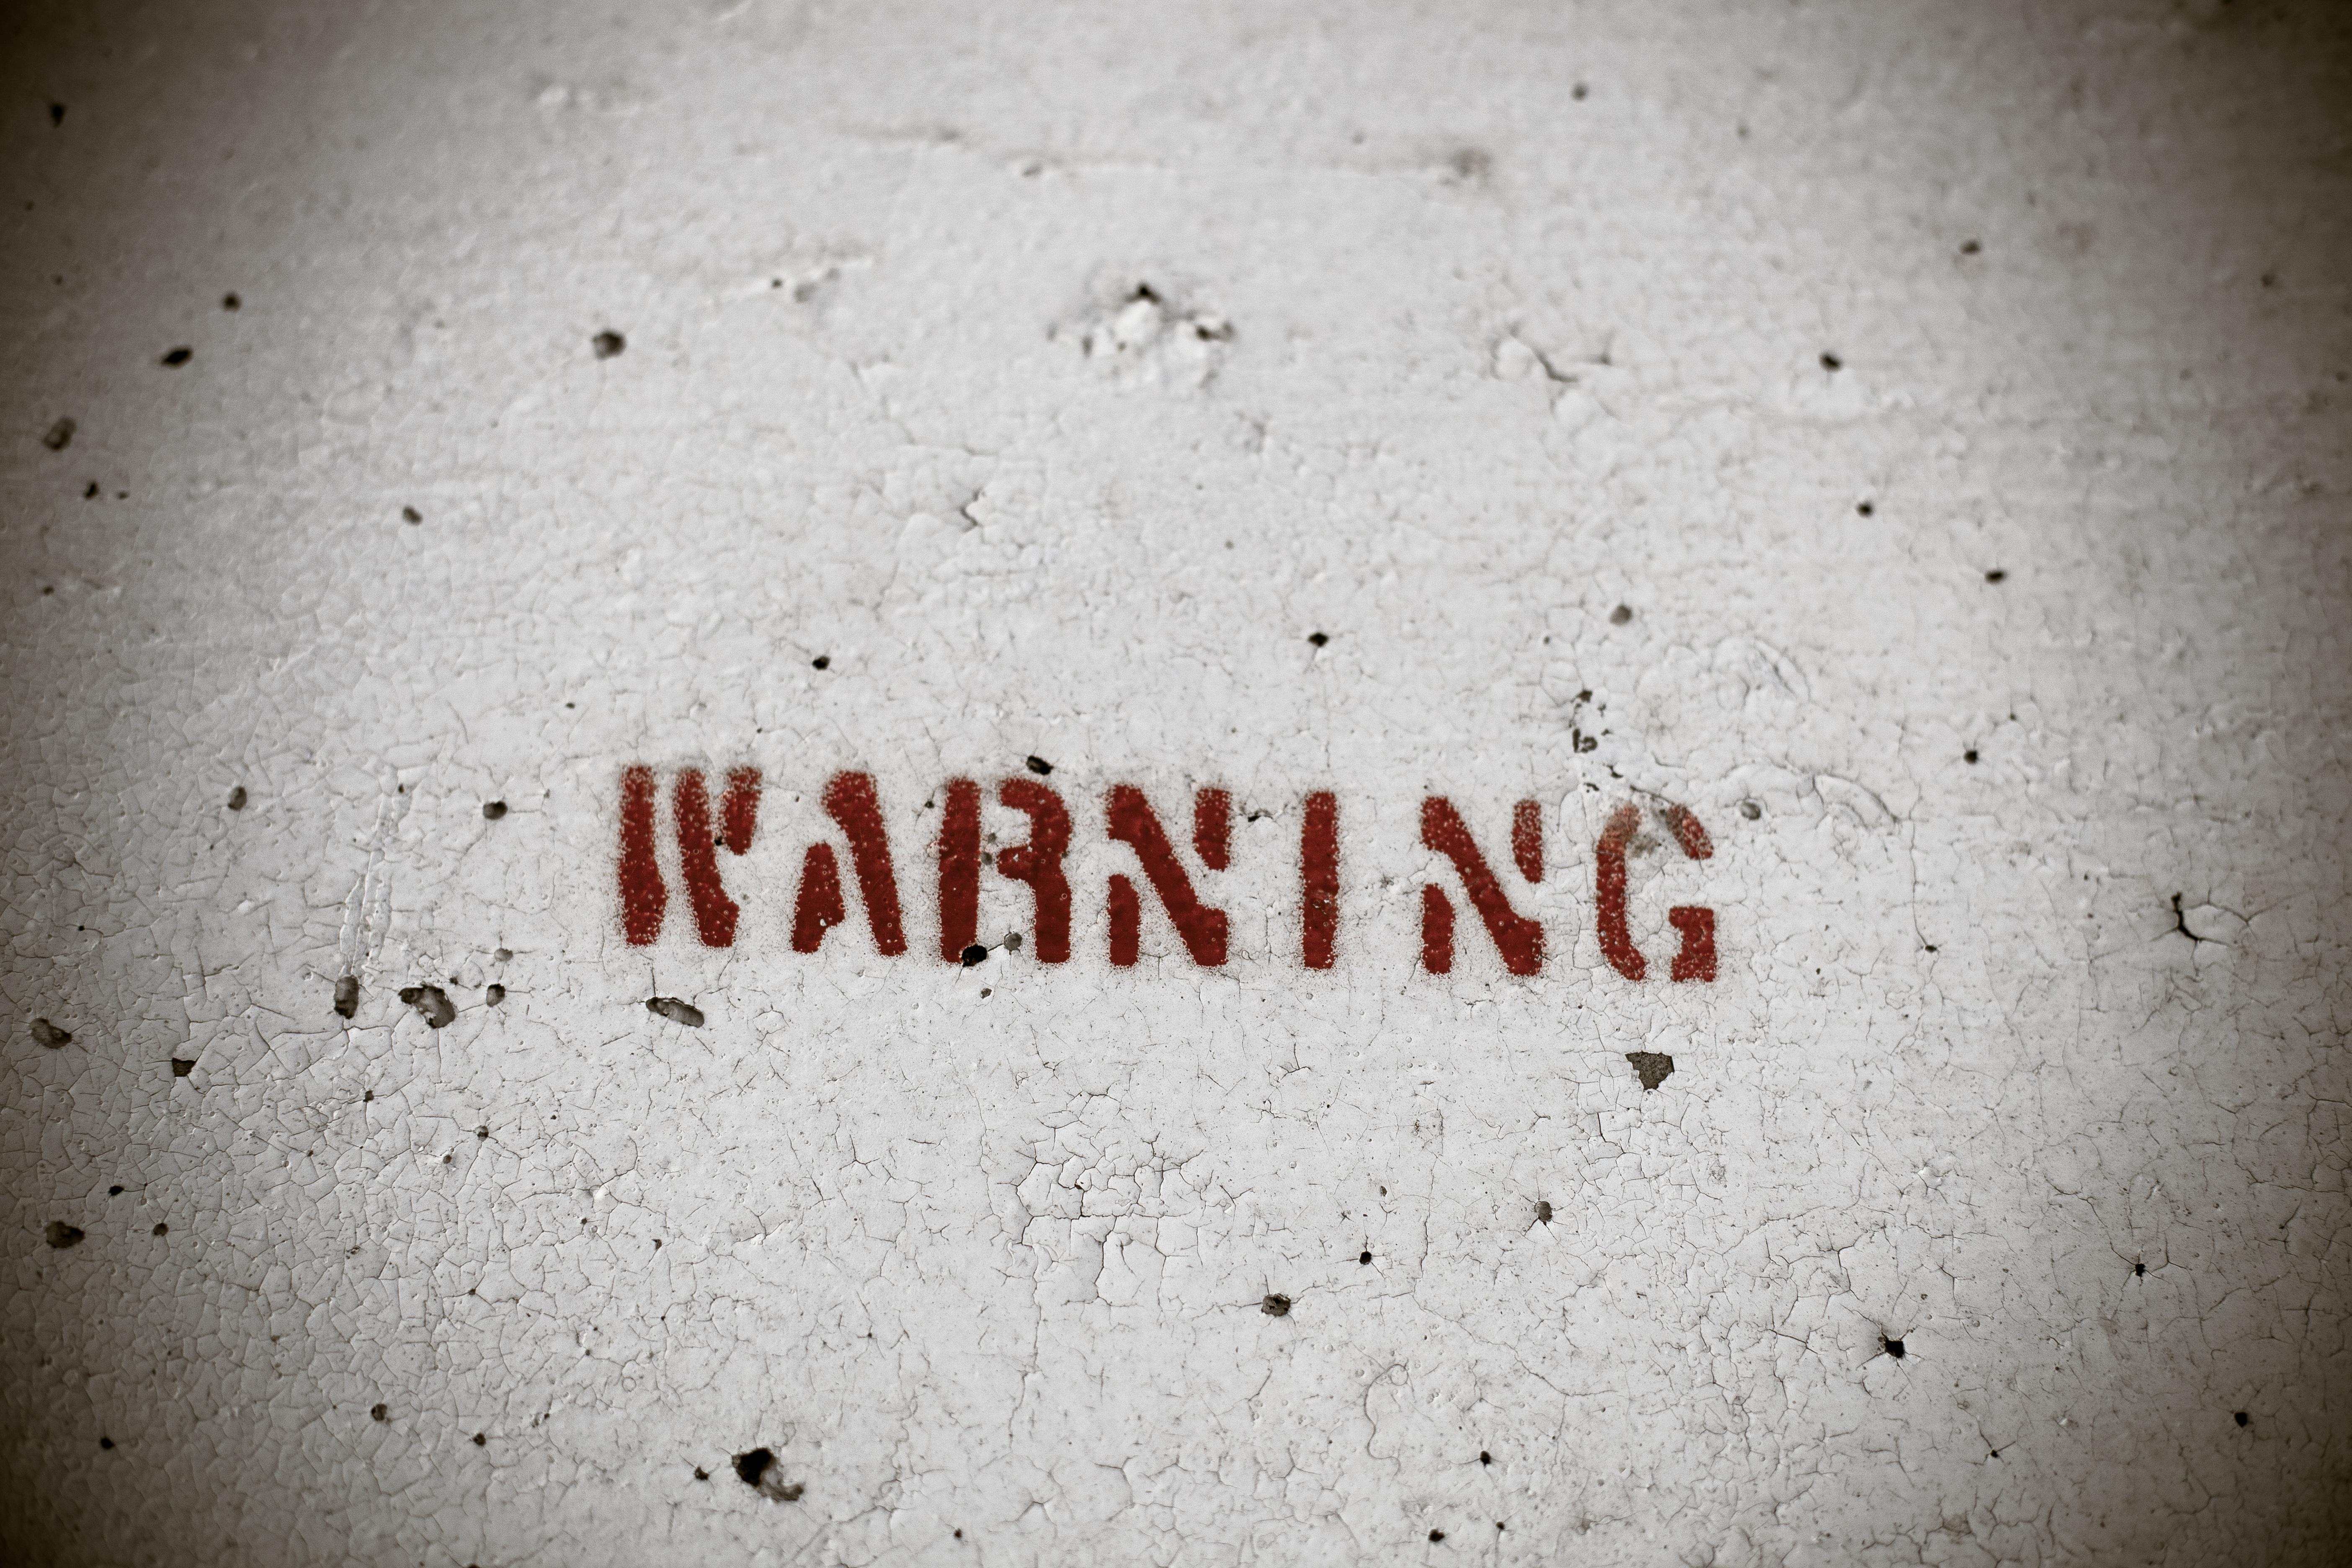 Warning - Peeling Wall Texture, Damaged, Grunge, Grungy, Old, HQ Photo